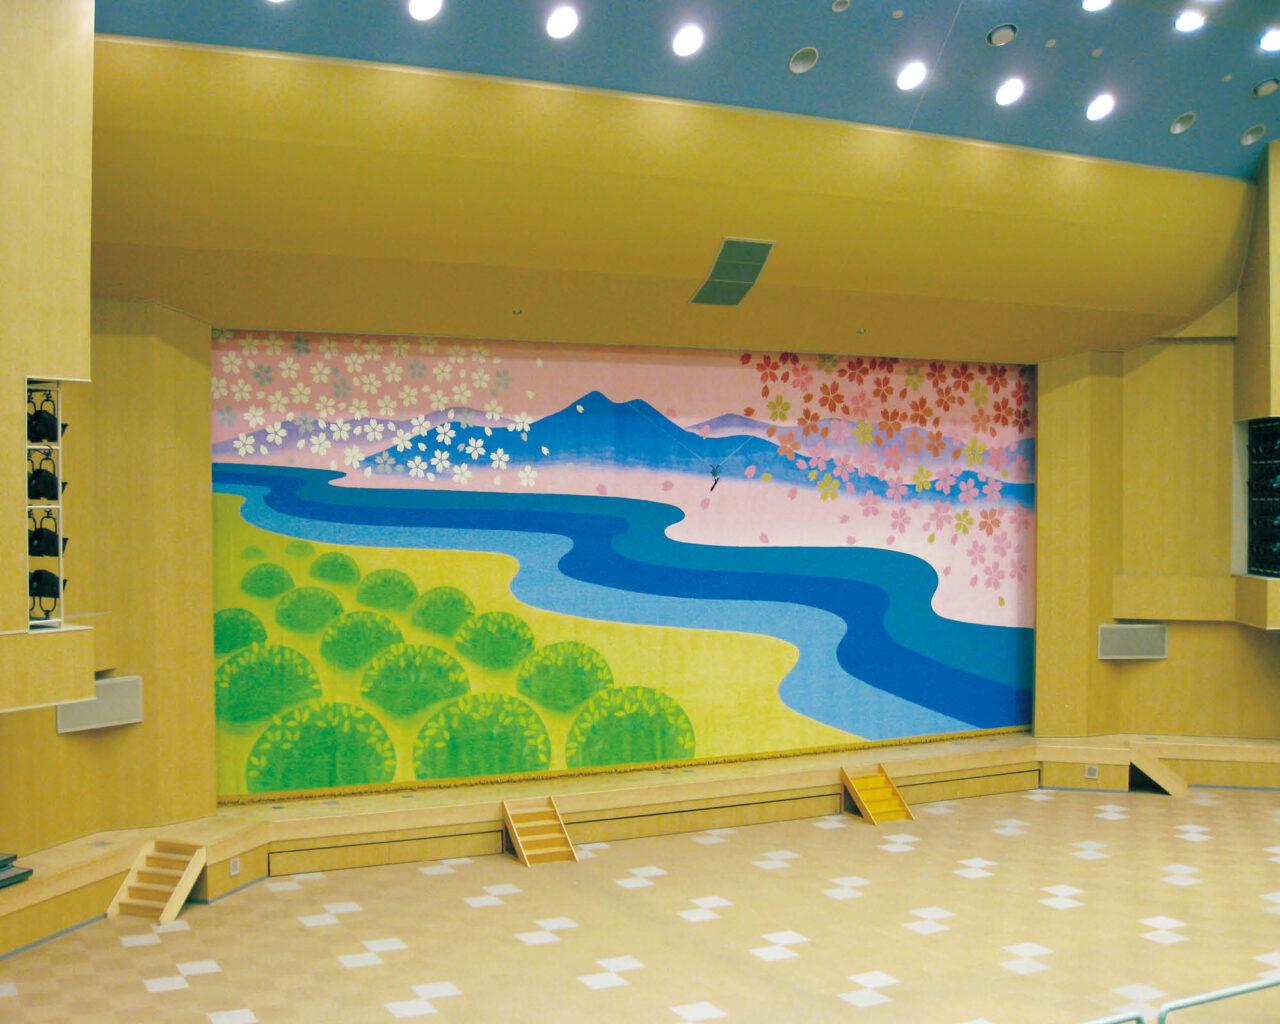 https://www.shizuoka-cb.com/wp-content/uploads/2021/01/photo-venues68-1280x1024.jpg